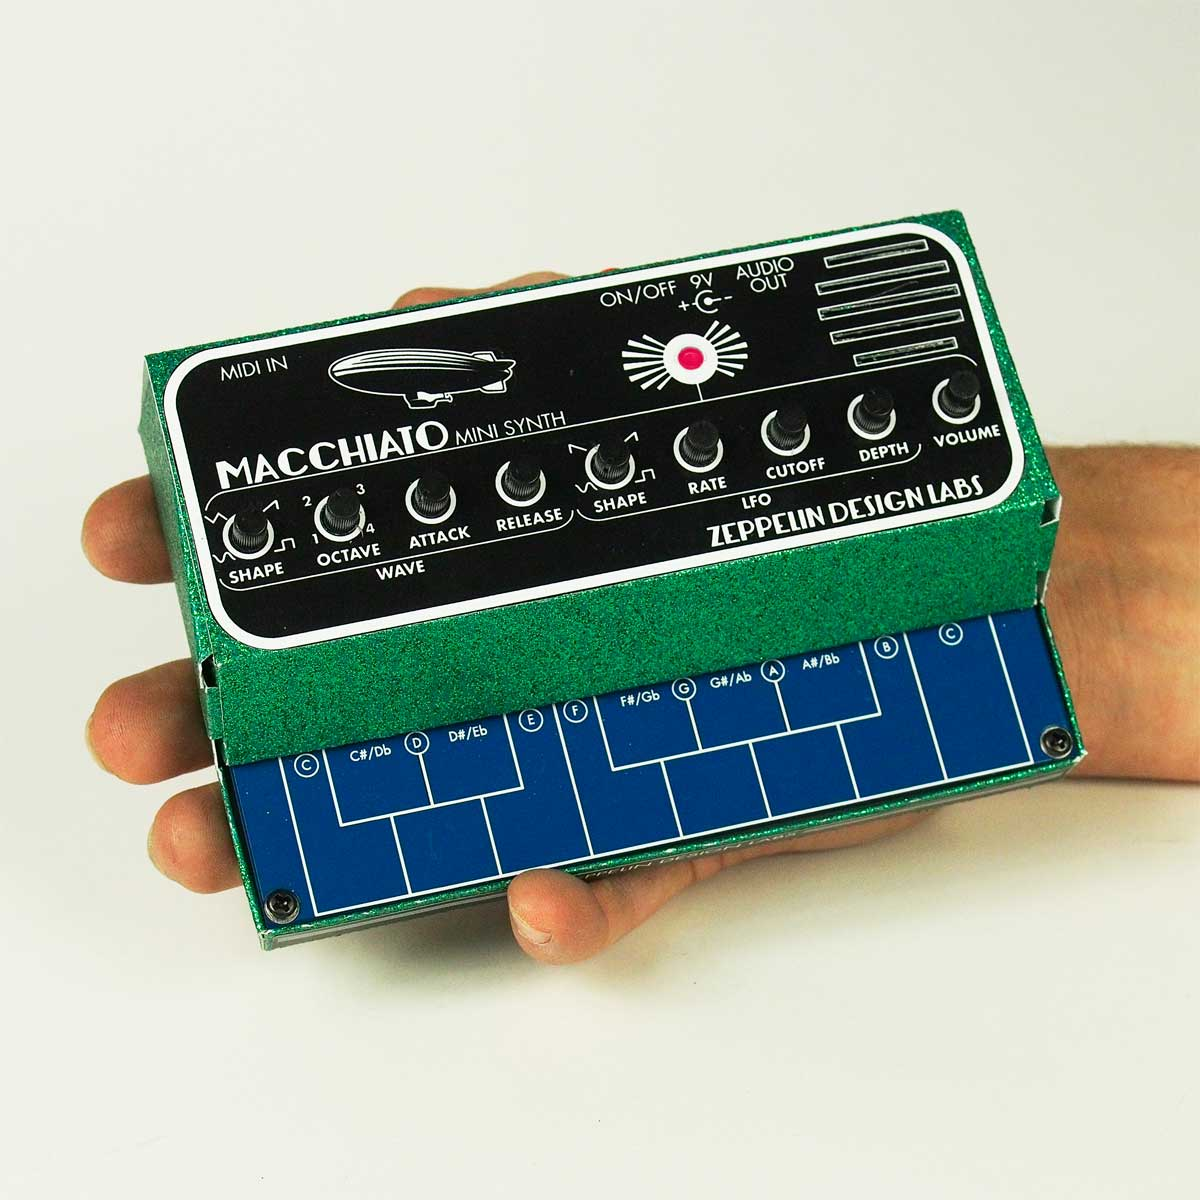 Macchiato Mini Synth Digital Synthesizer Zeppelin Design